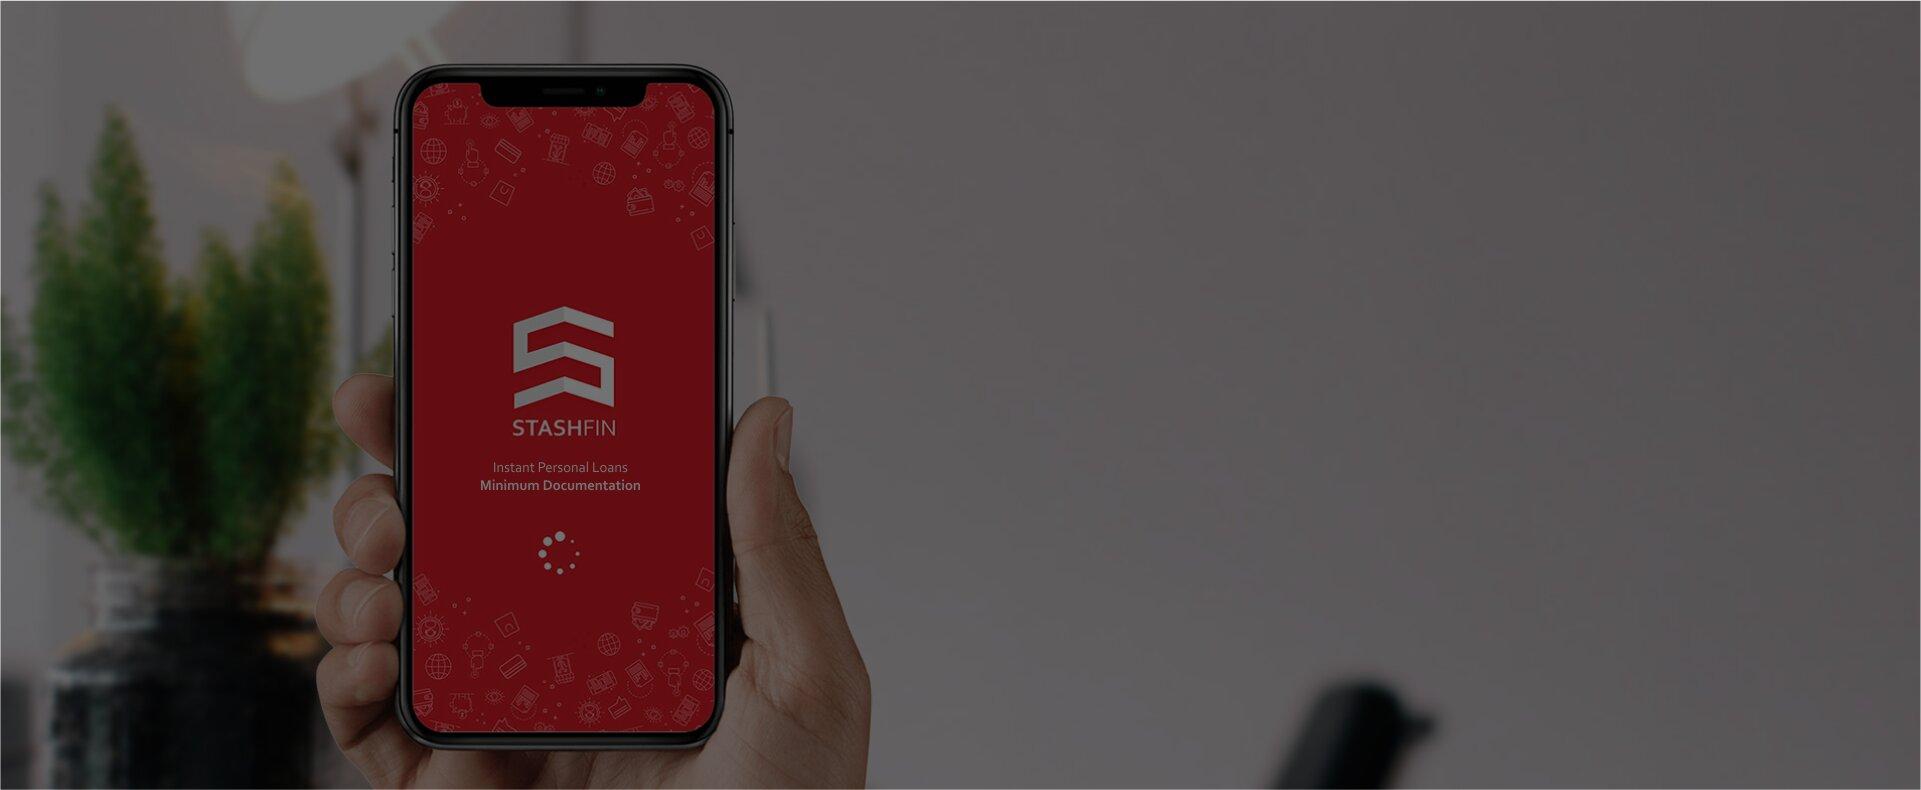 StashFin App Benefits